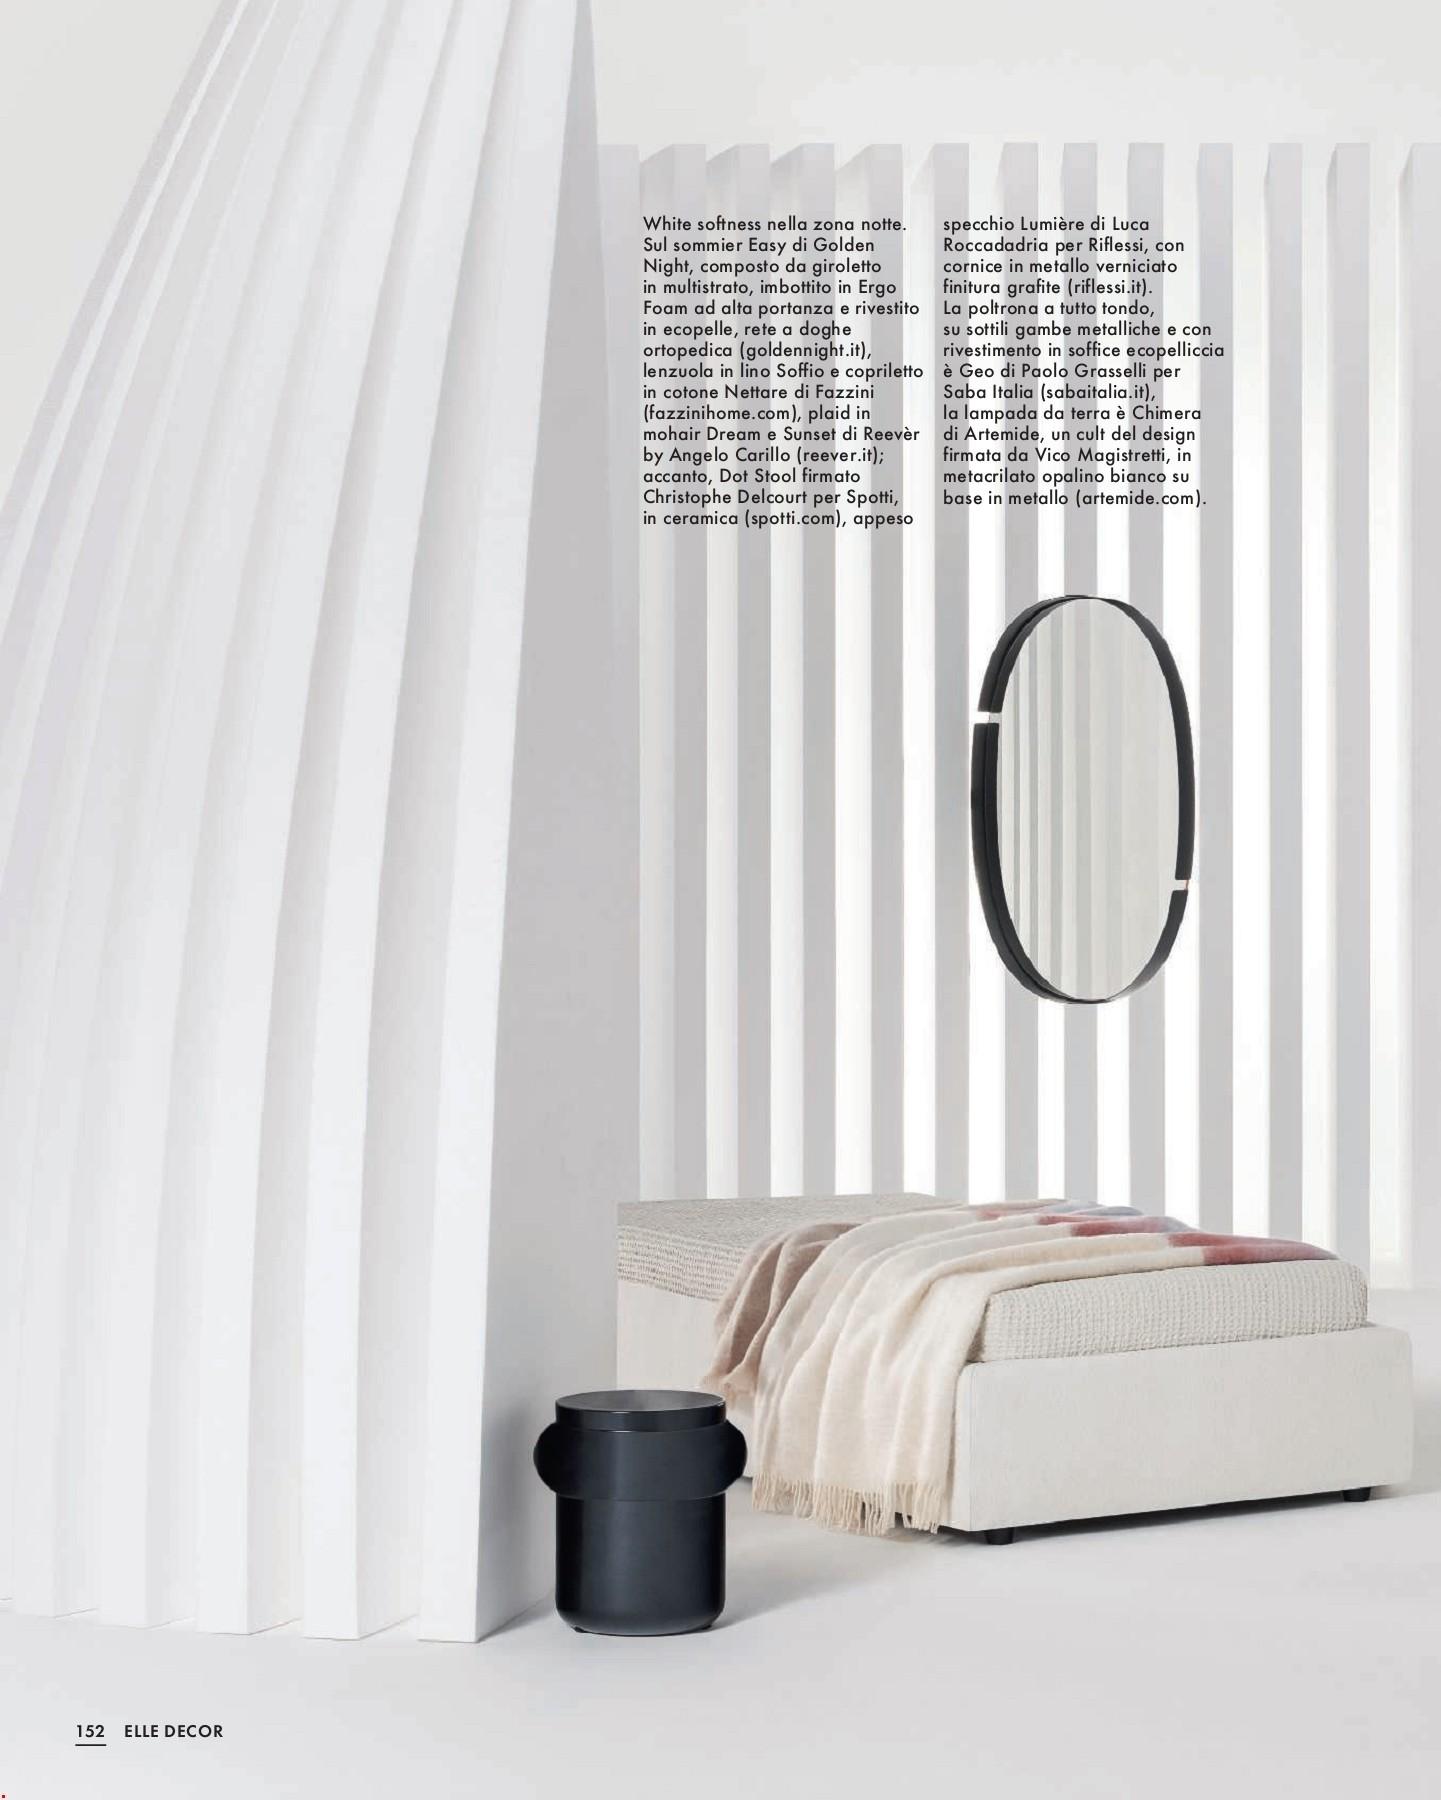 Cornice Lunga E Stretta elle decor italia_decjan2019-flip book pages 151-200 | pubhtml5